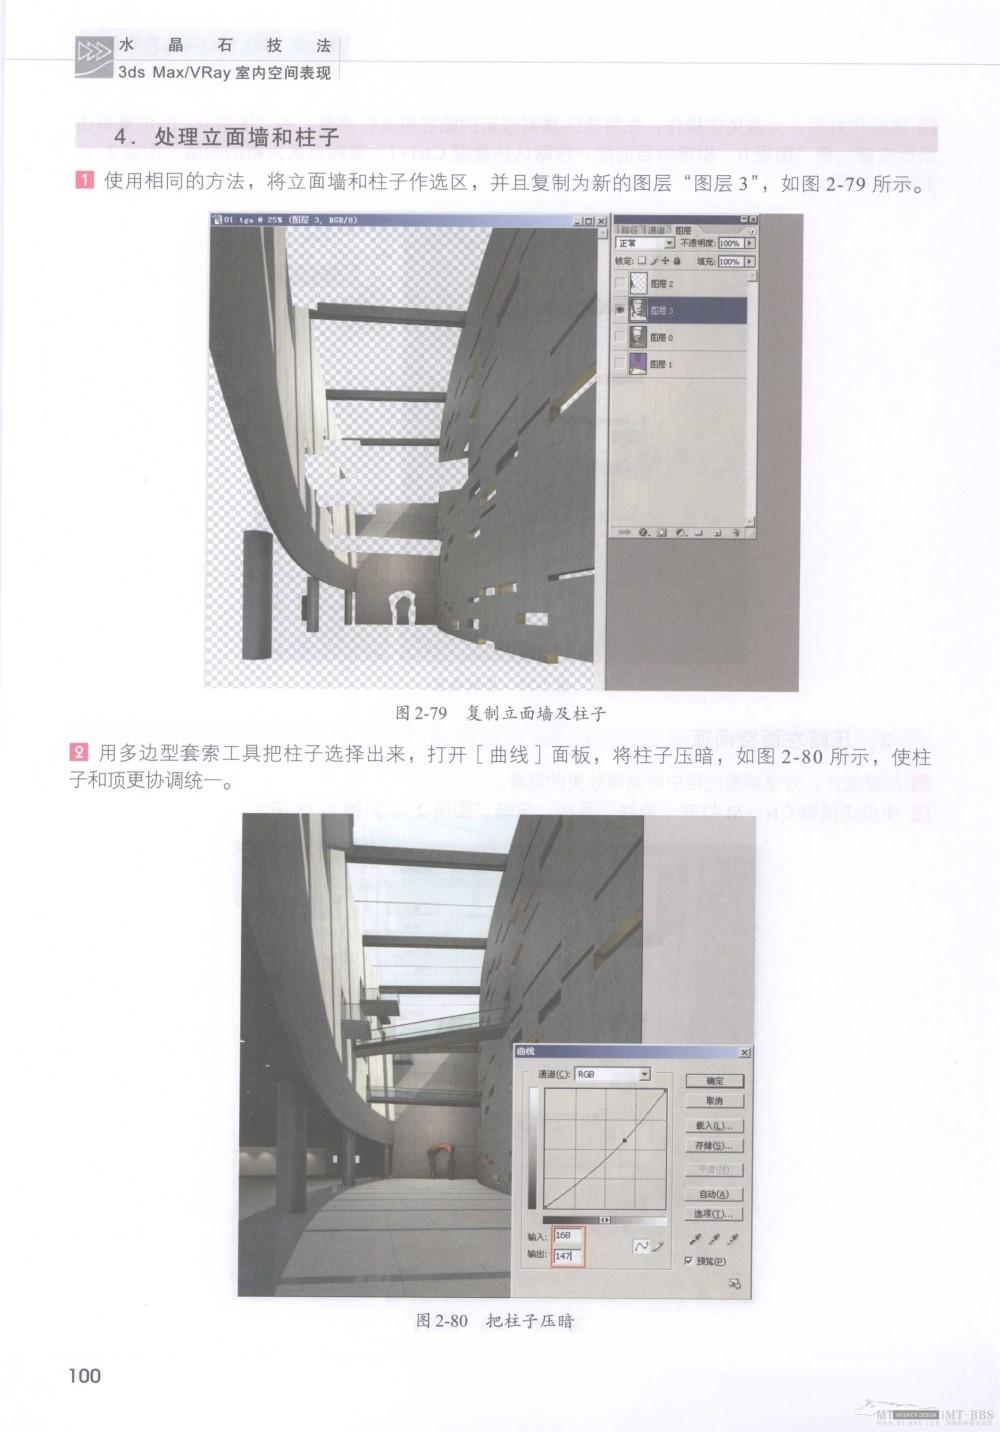 水晶石技法-3ds_Max&VRay室内空间表现_水晶石技法-3ds_Max&VRay室内空间表现_页面_106.jpg